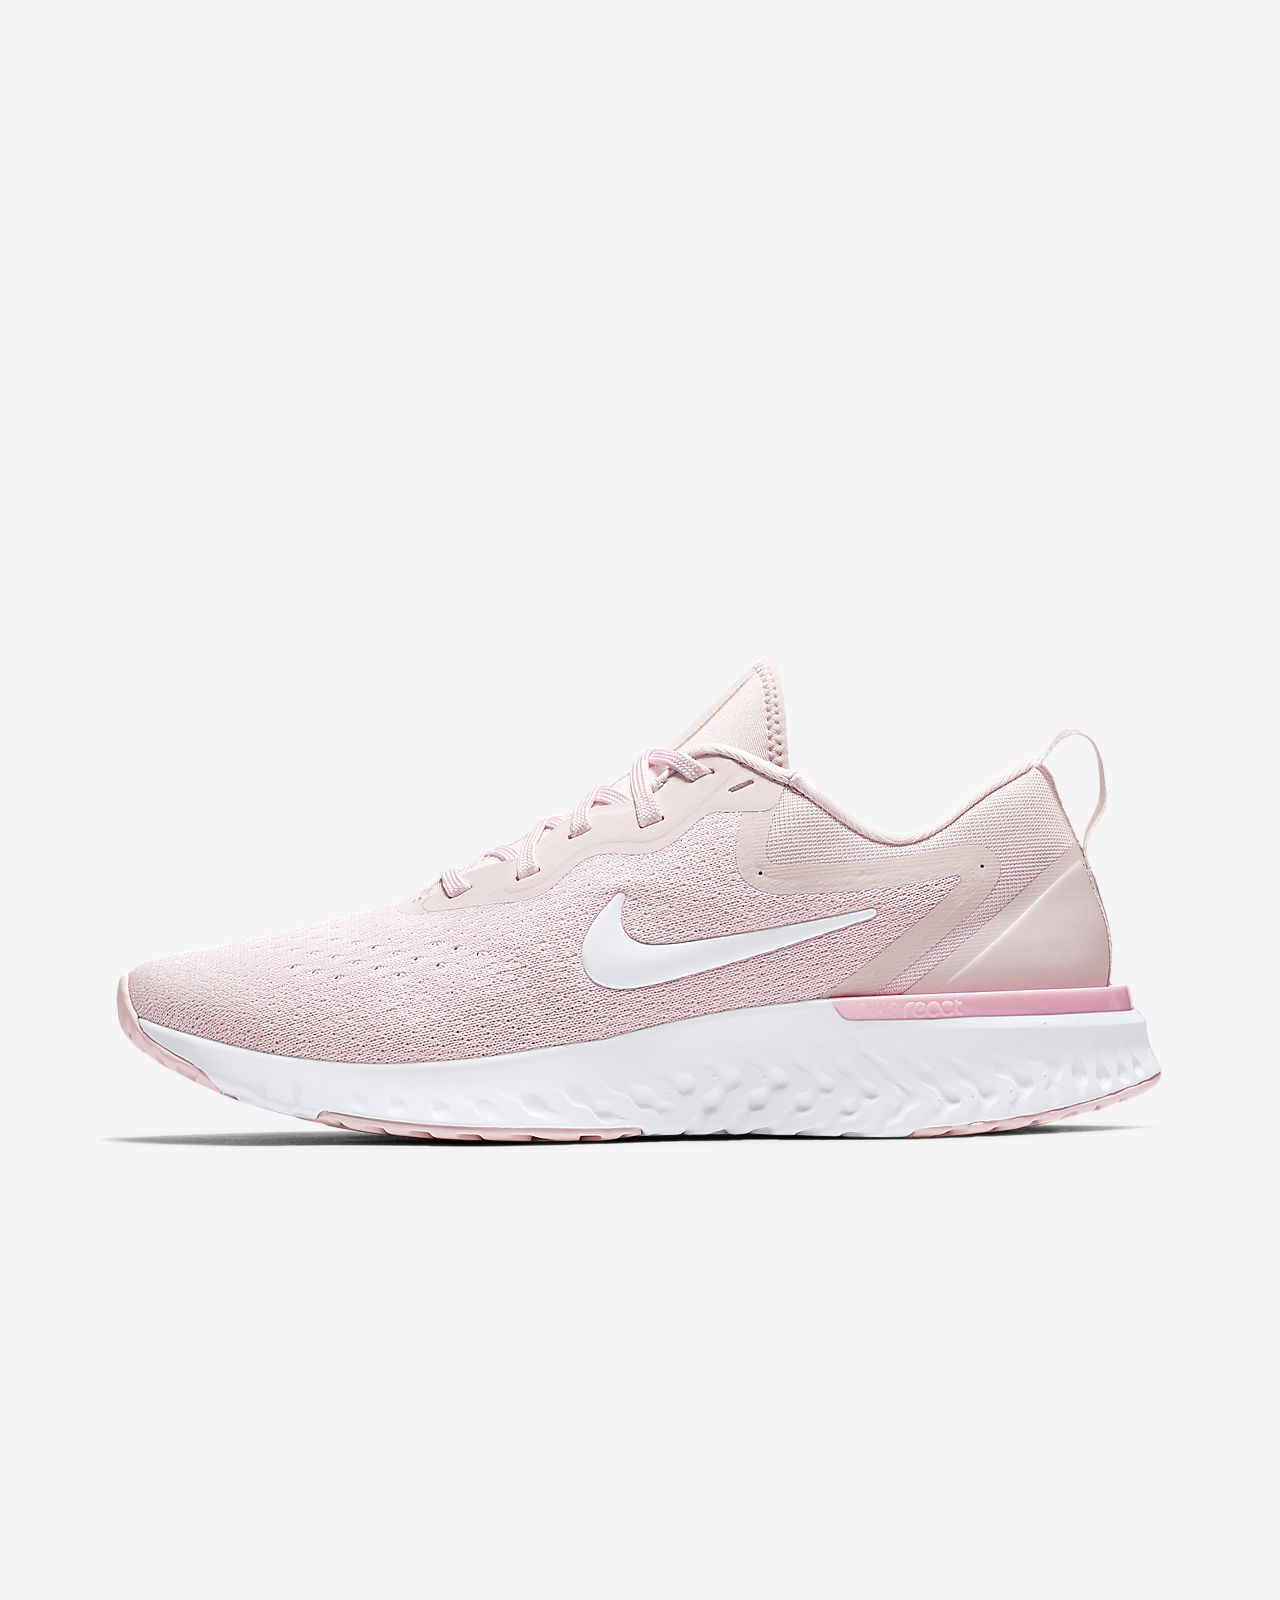 Pour Nike Odyssey De Femme React Running Ch Chaussure gvq1w8Hnx